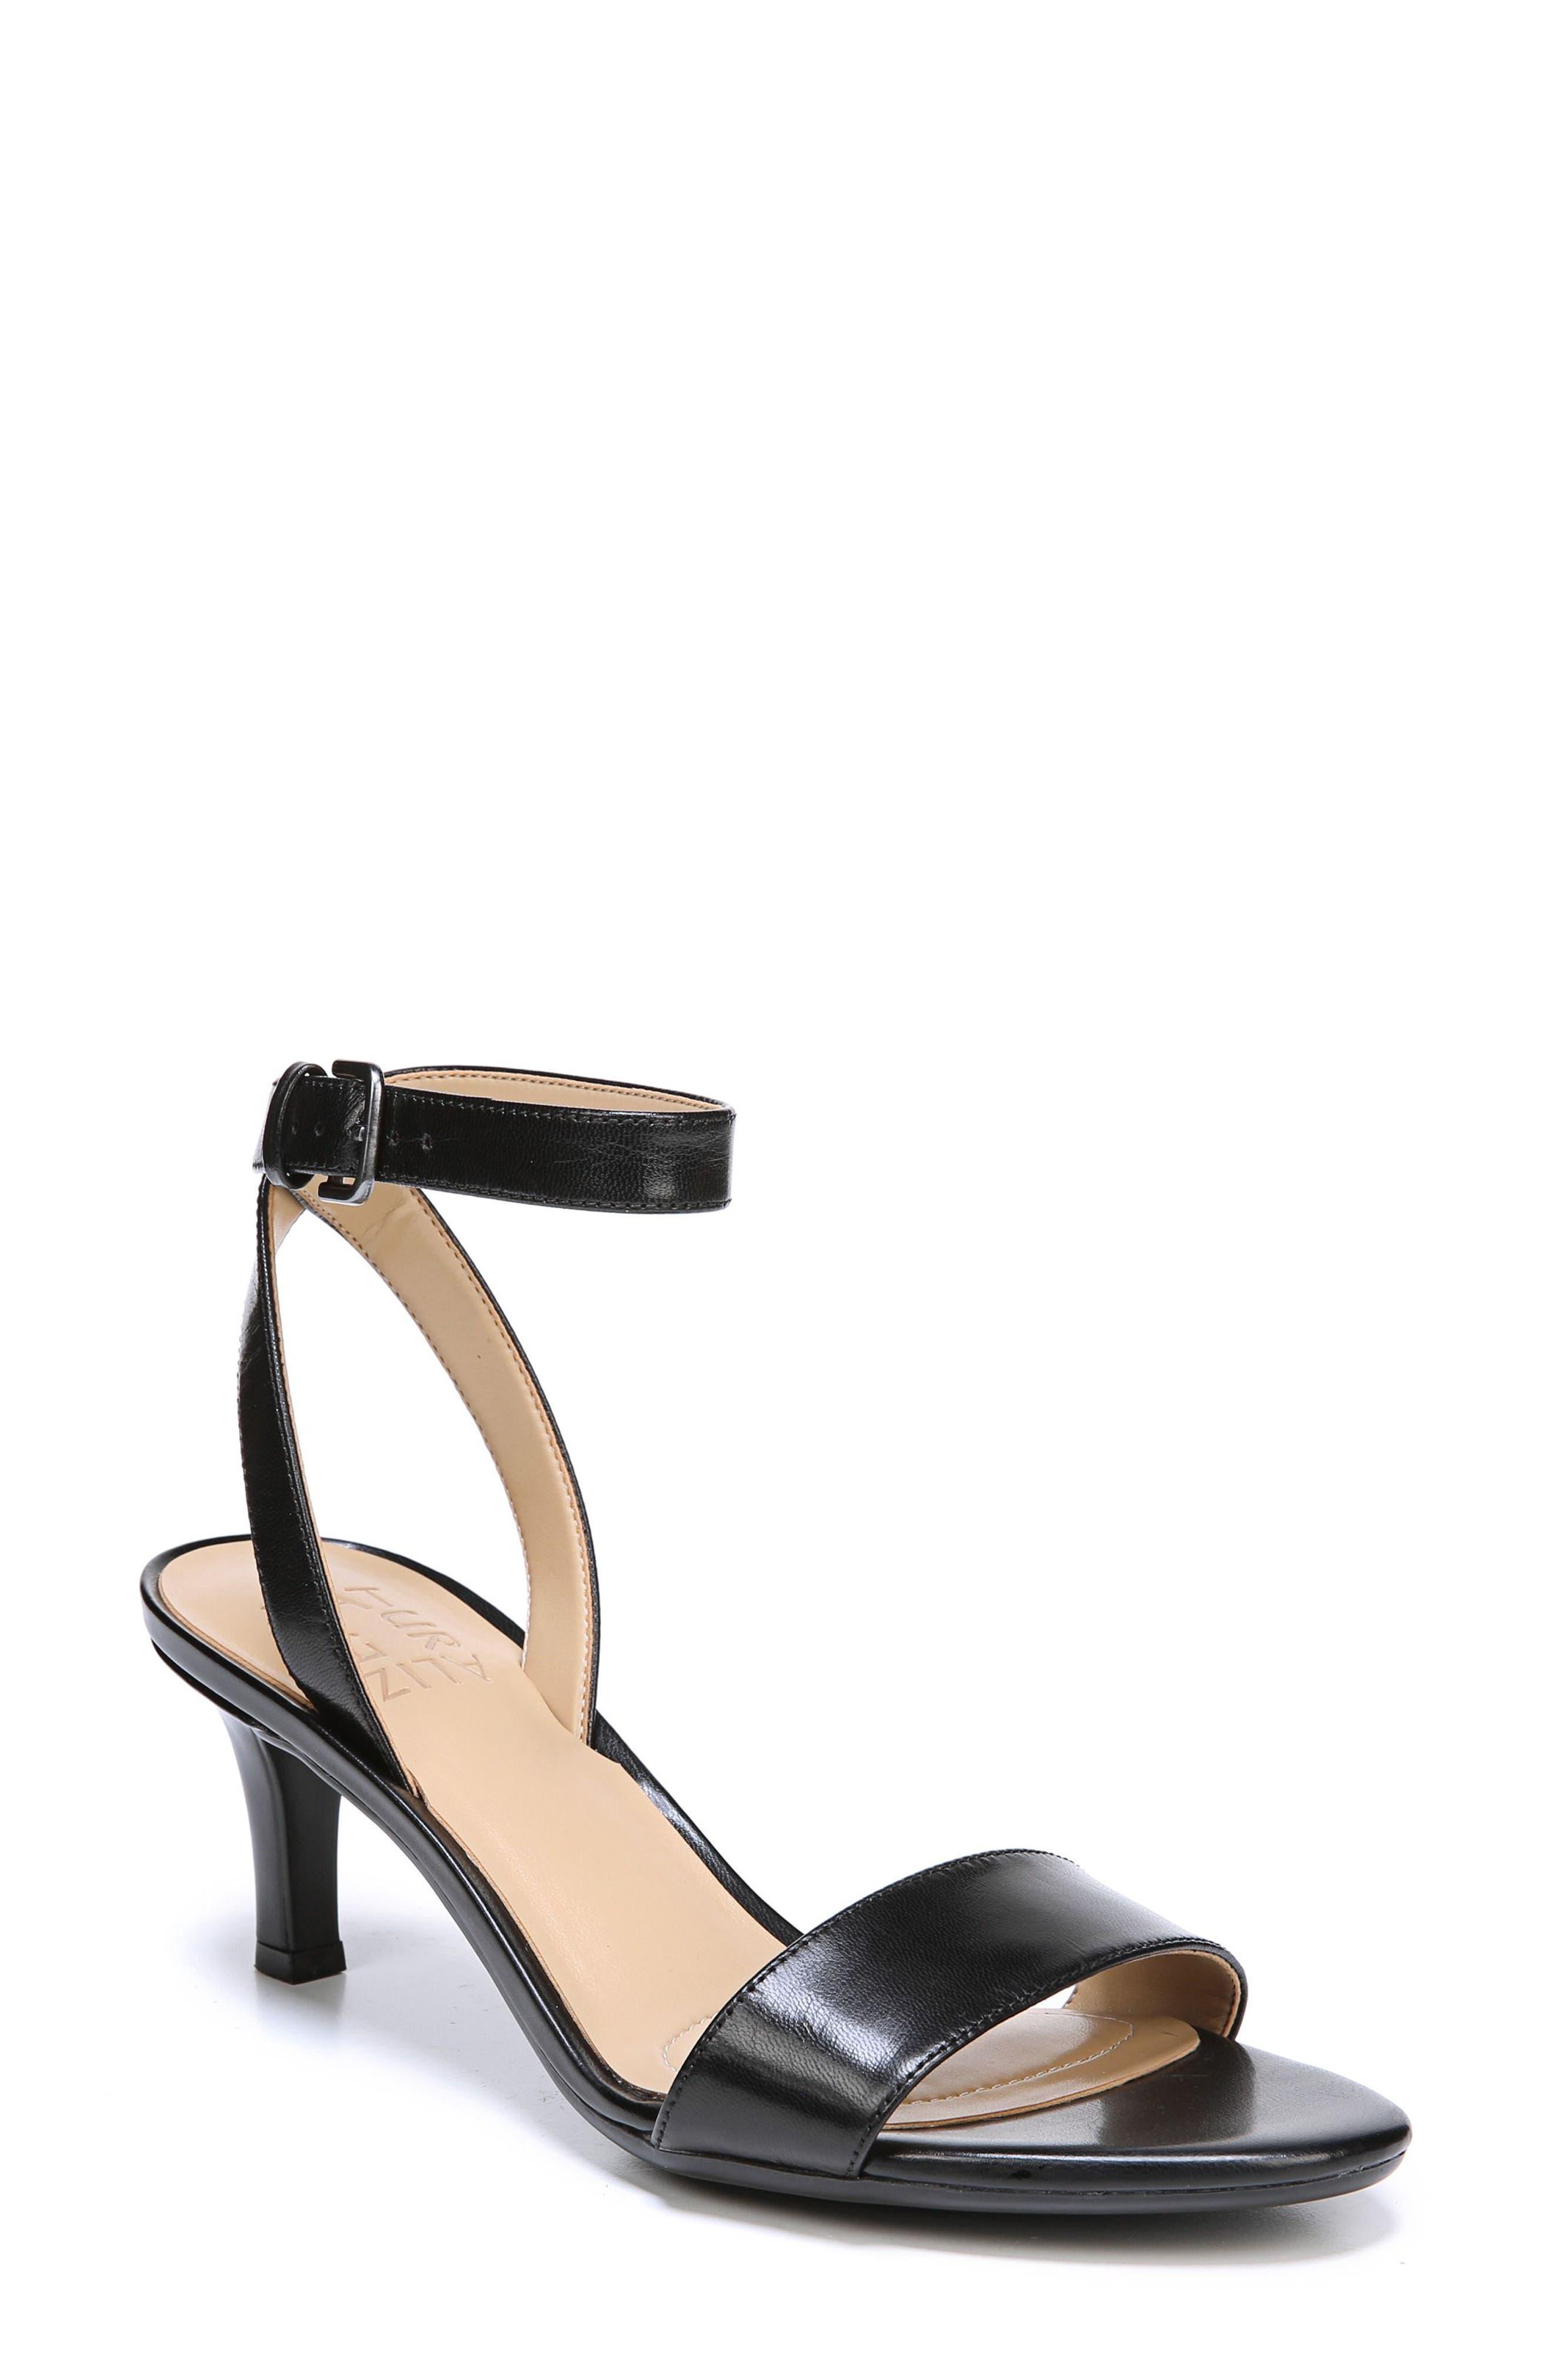 Tinda Sandal,                         Main,                         color, Black Leather